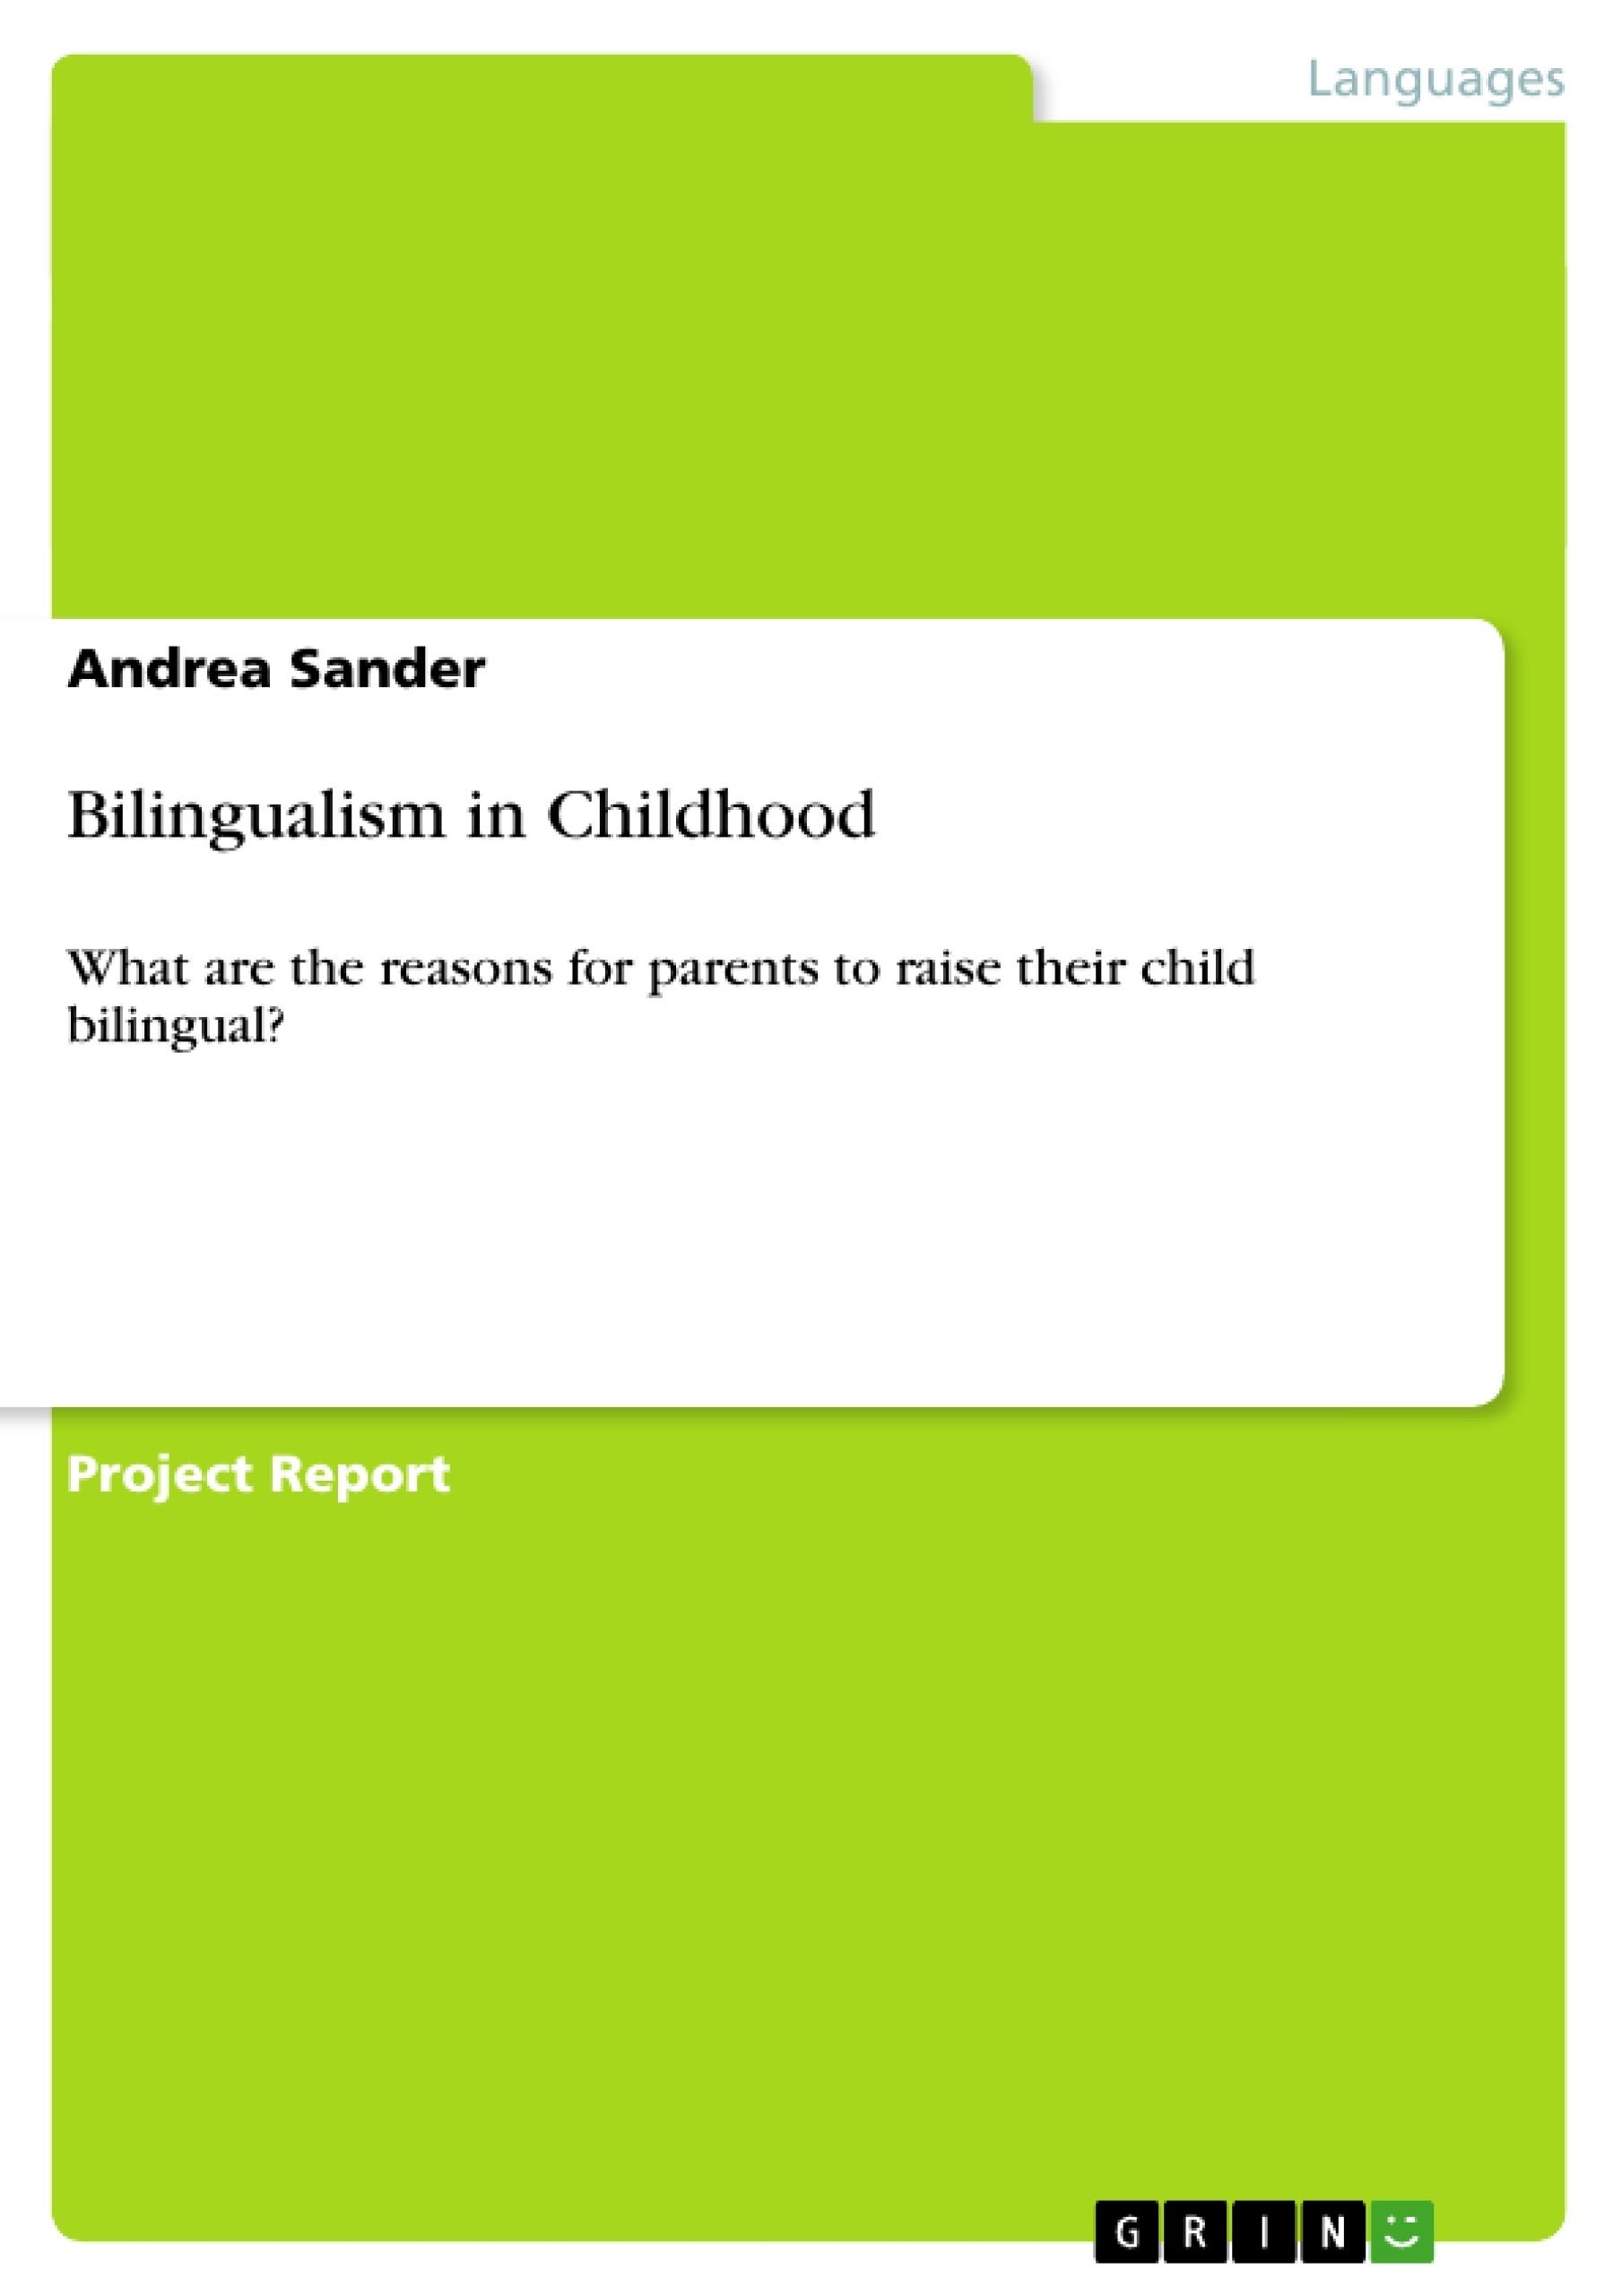 Bilingual Education Essay Examples